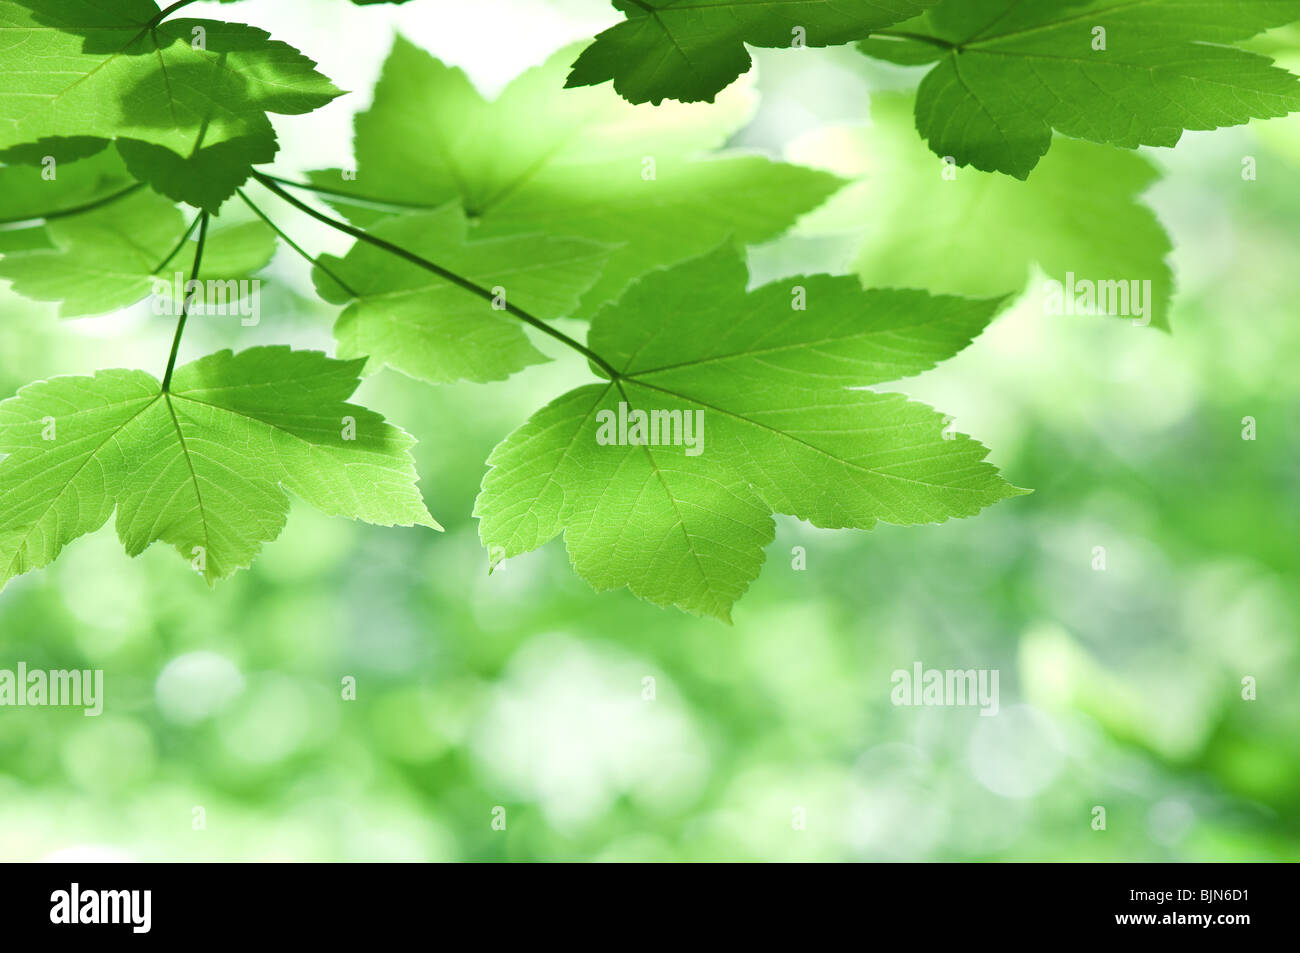 Verde foglie di acero close up Immagini Stock